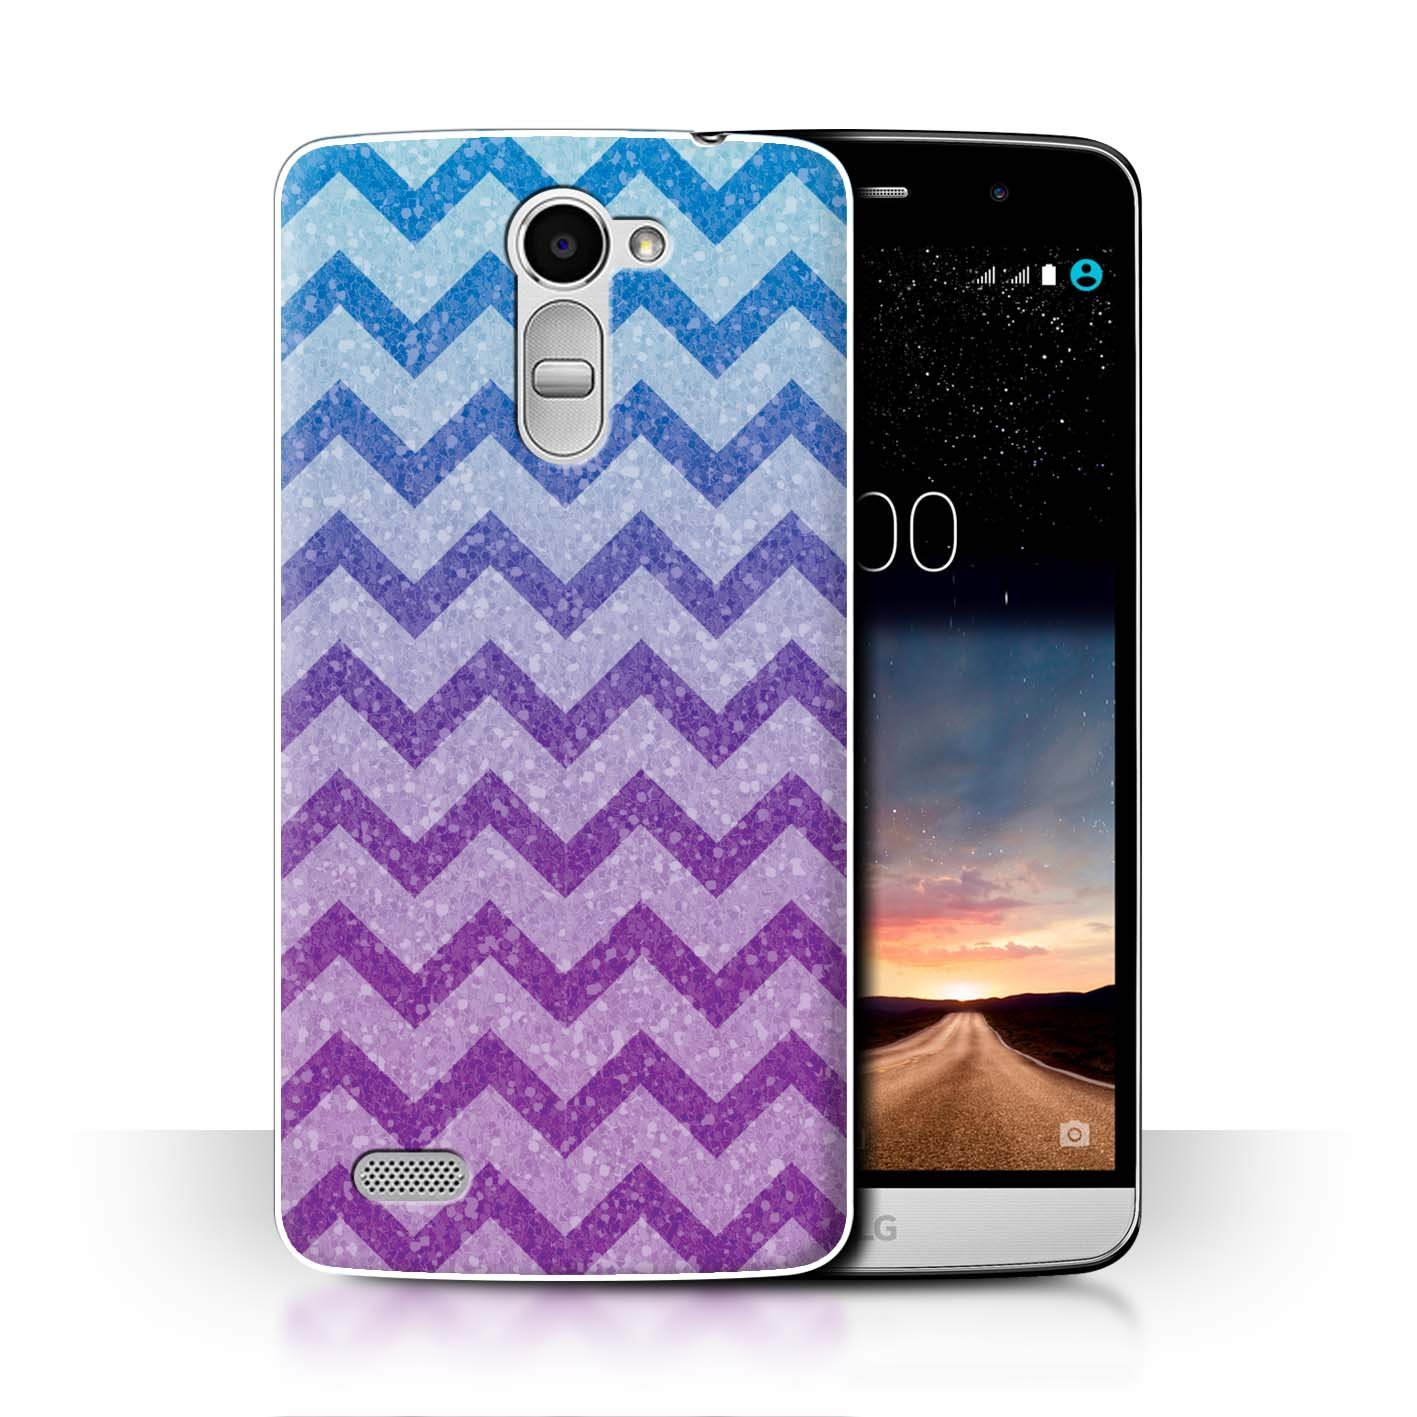 STUFF4 Phone Case/Cover/Skin/LG-CC/Morado Fashion Collection ...